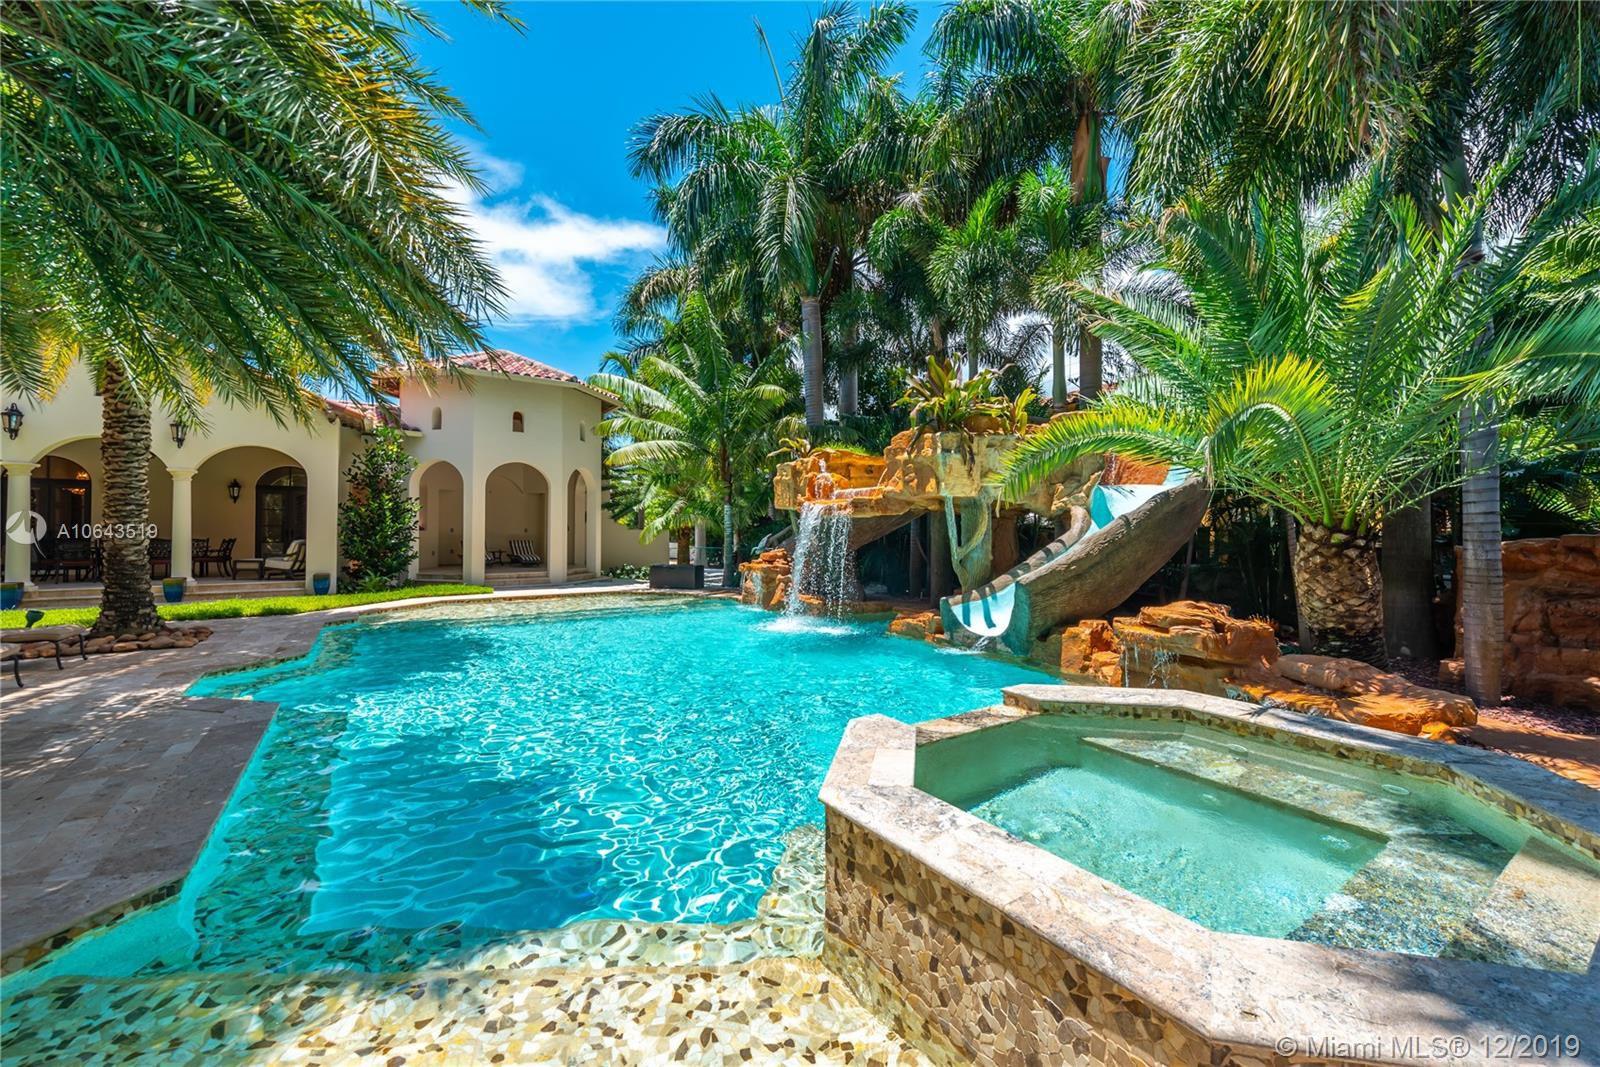 3400 pine tree dr, miami beach, fl 33140 - 7 bed, 8 bath single-family home  - mls# a10643519 - 52 photos | trulia